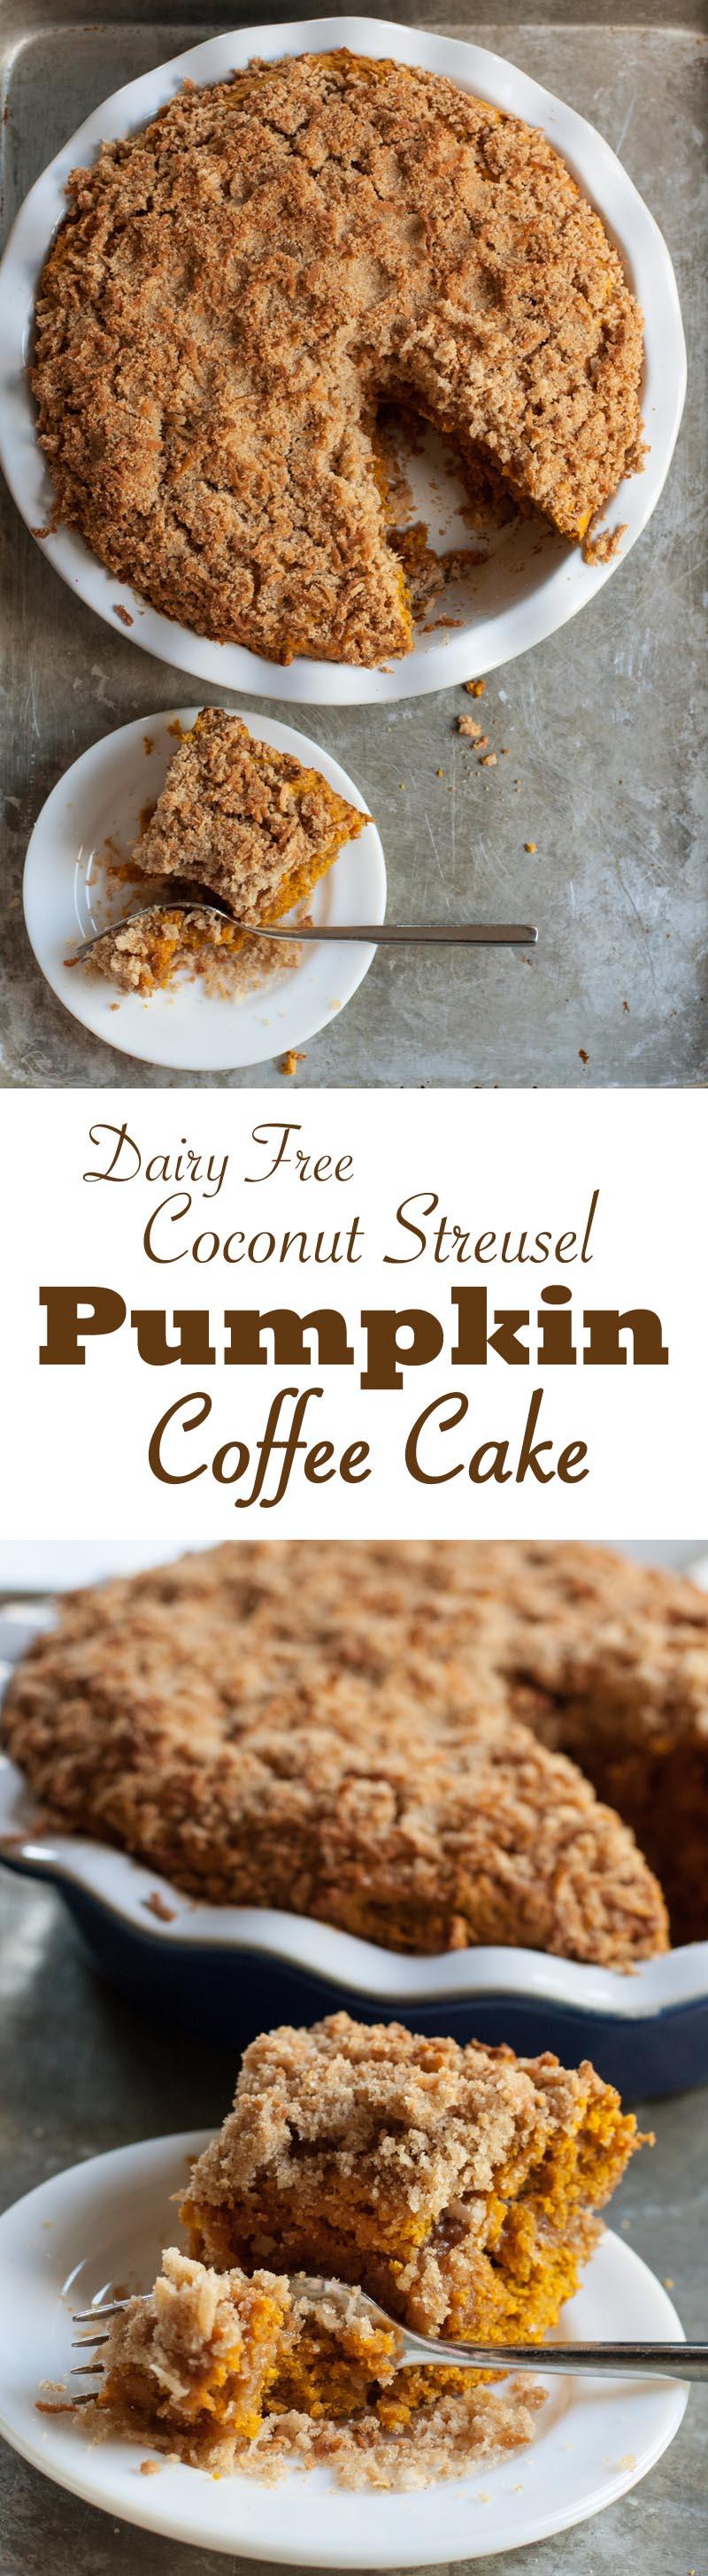 Dairy Free Coconut Streusel Pumpkin Coffee Cake | Sweet Anna's